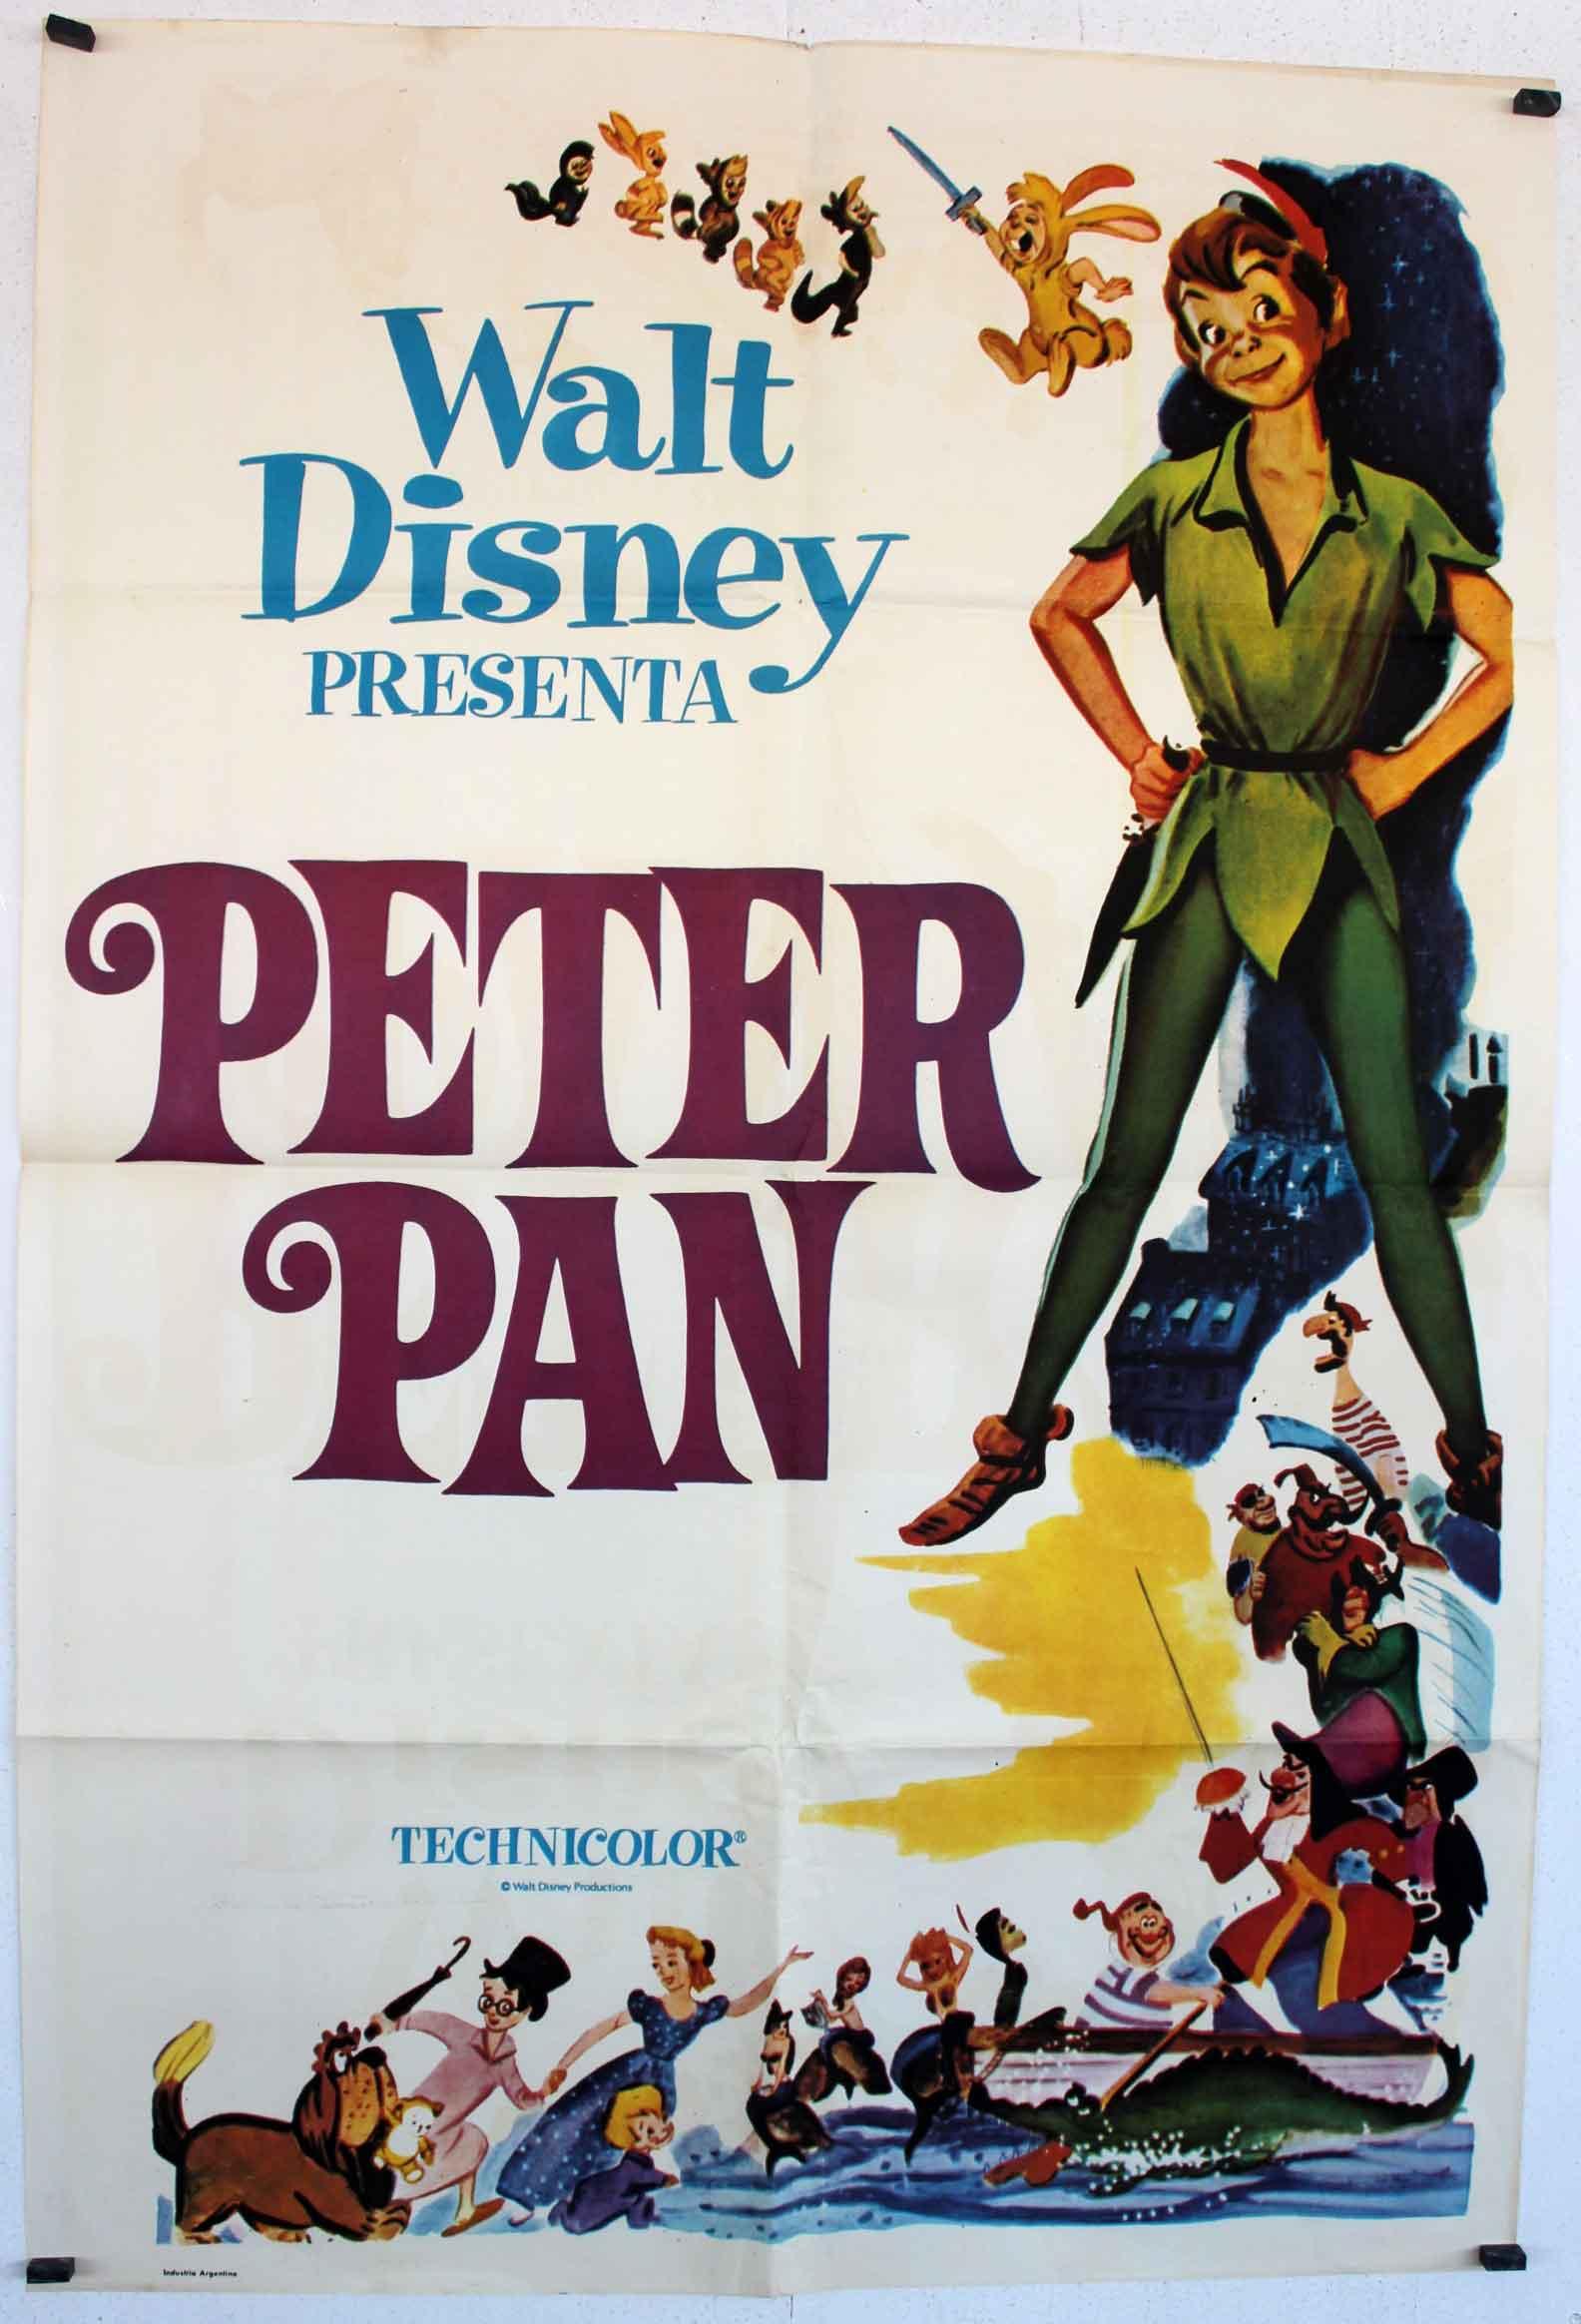 Quot Peter Pan Quot Movie Poster Quot Peter Pan Quot Movie Poster